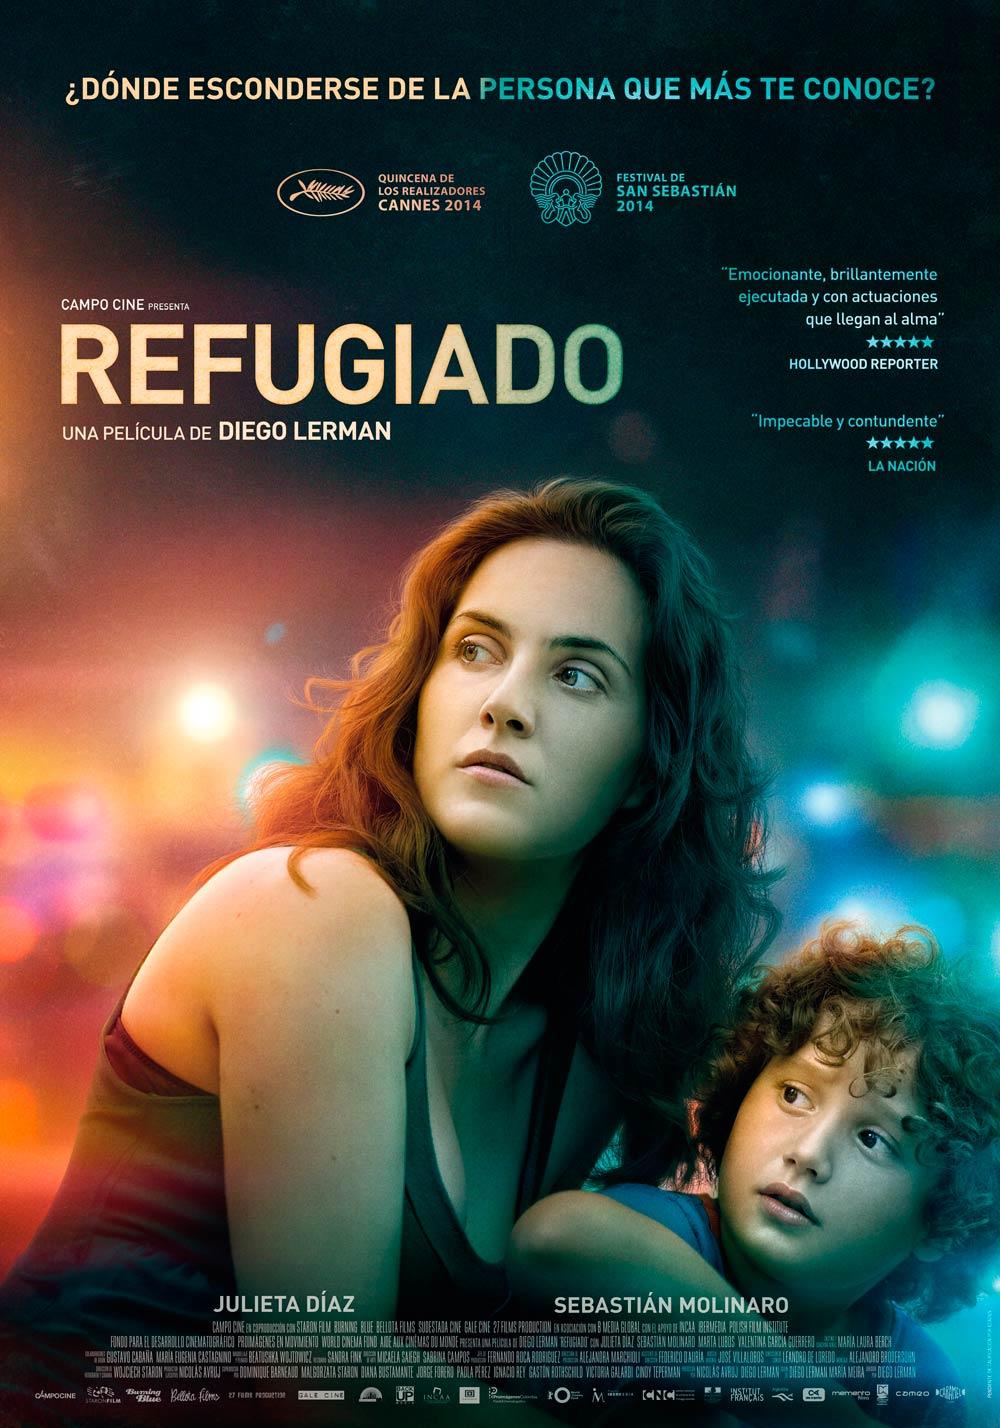 Ver Refugiado Online (2014) Gratis HD Pelicula Completa